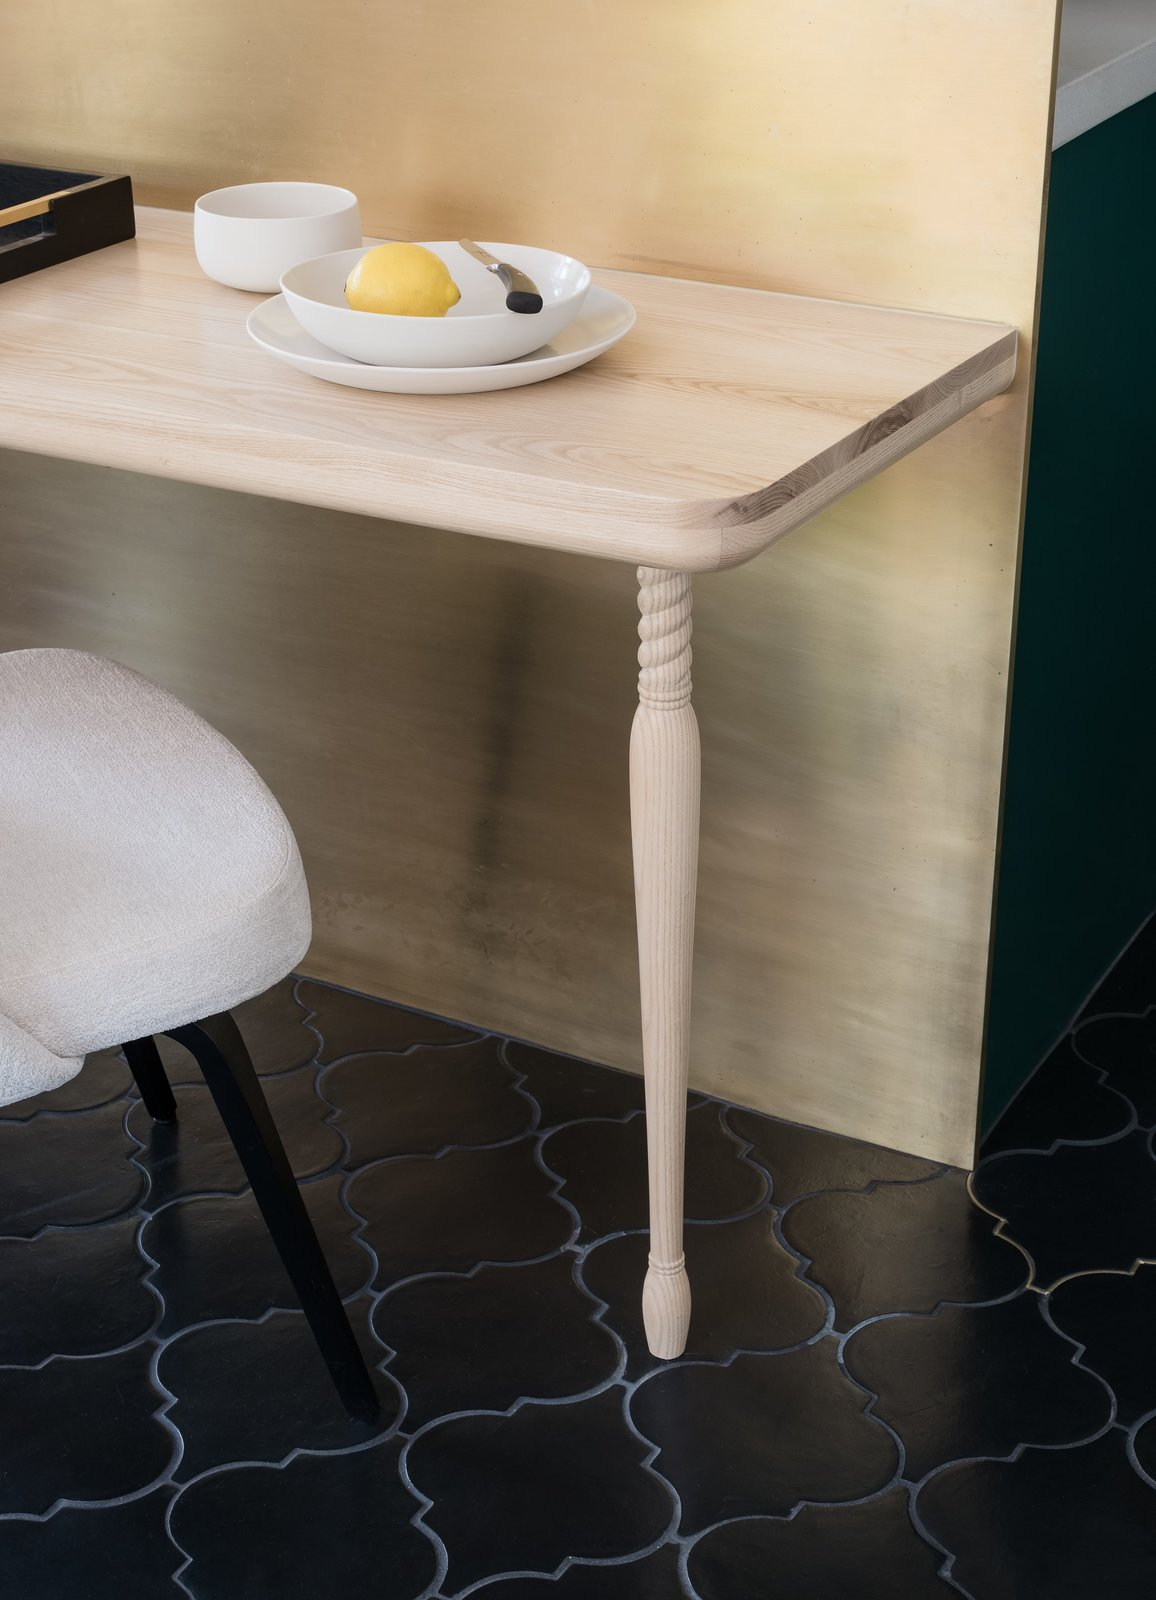 Síol Studios Genesee Residence Kitchen Brass backsplash terra-cotta tiles